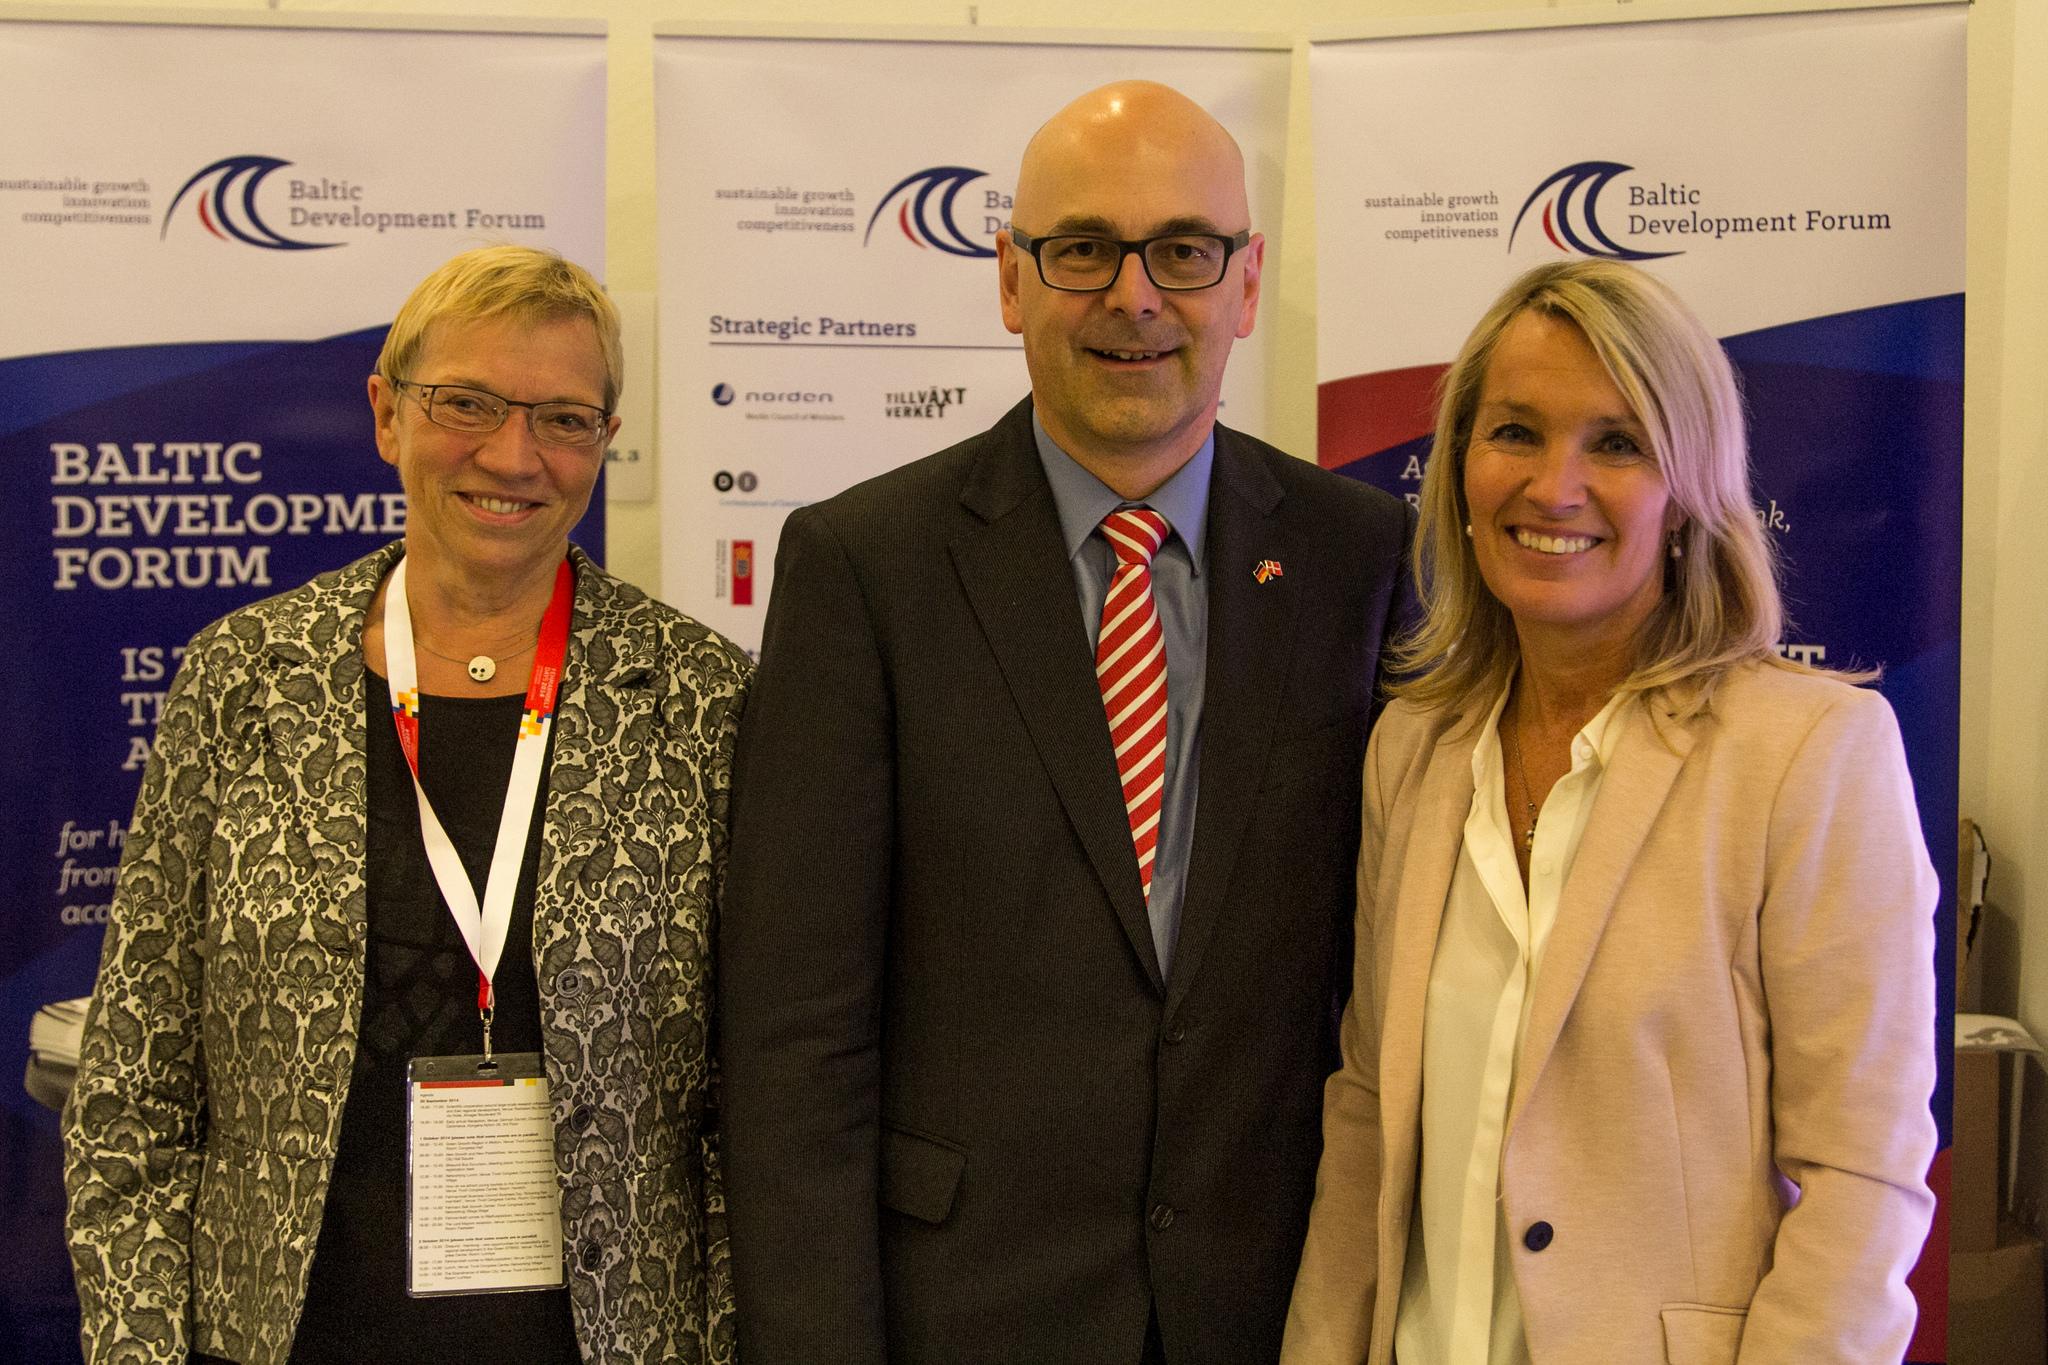 Anke Spoorendonk, Torsten Albig and Lene Espersen